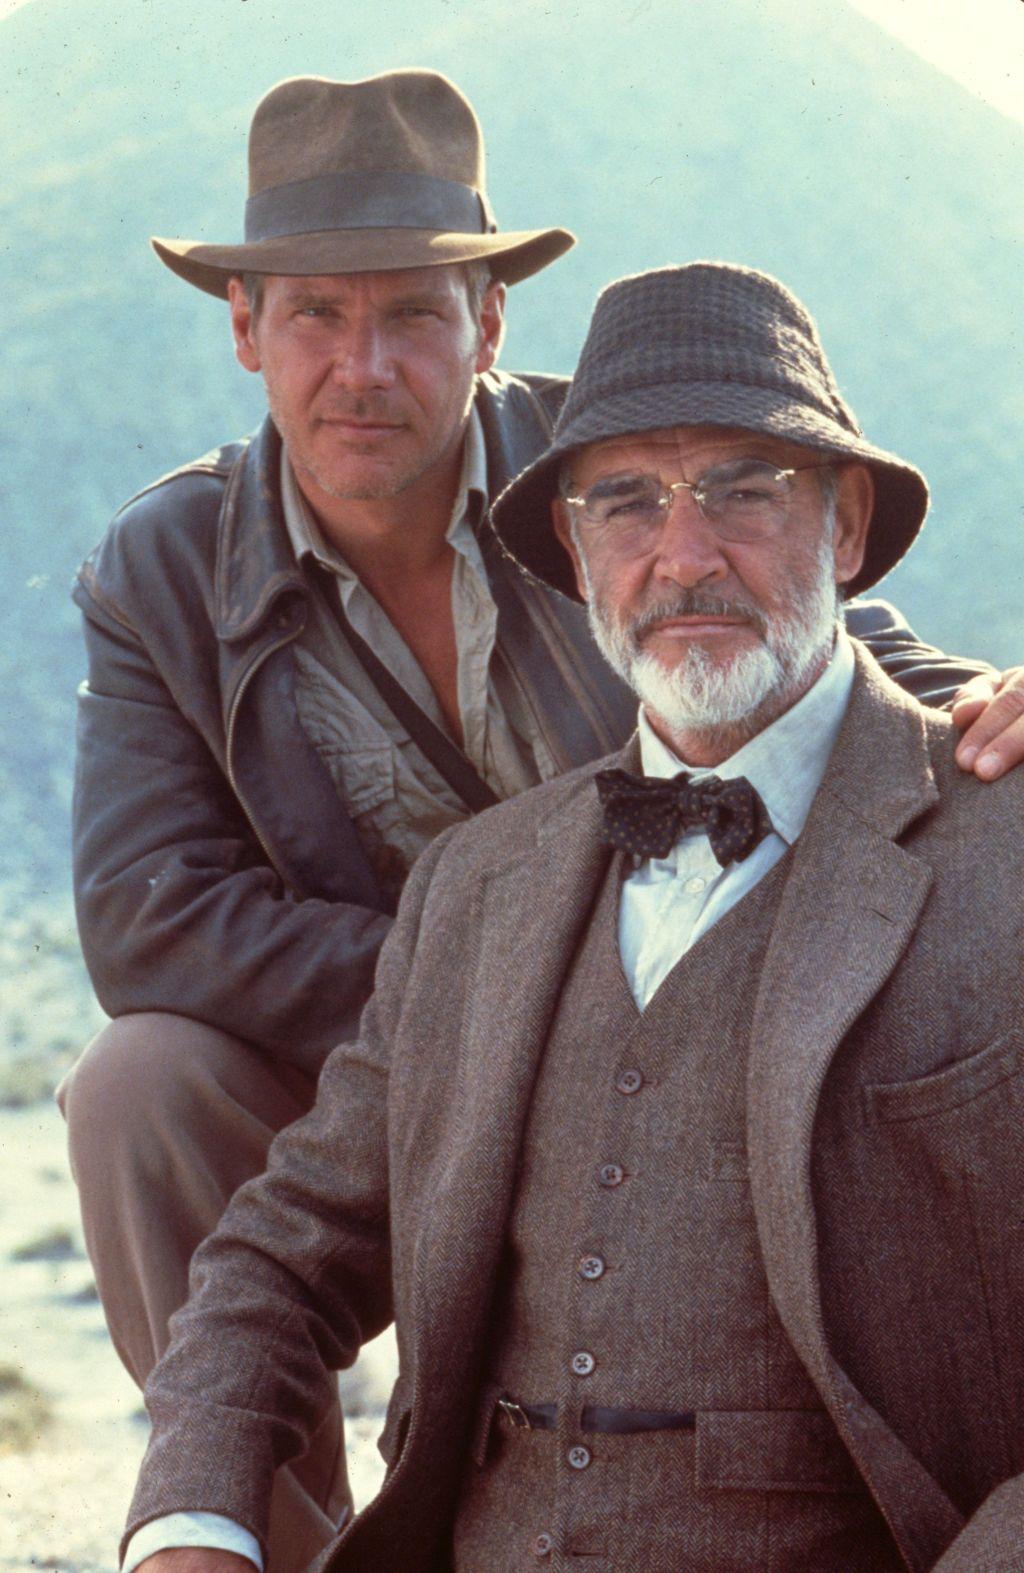 Harrison Ford, Sean Connery, Indiana Jones